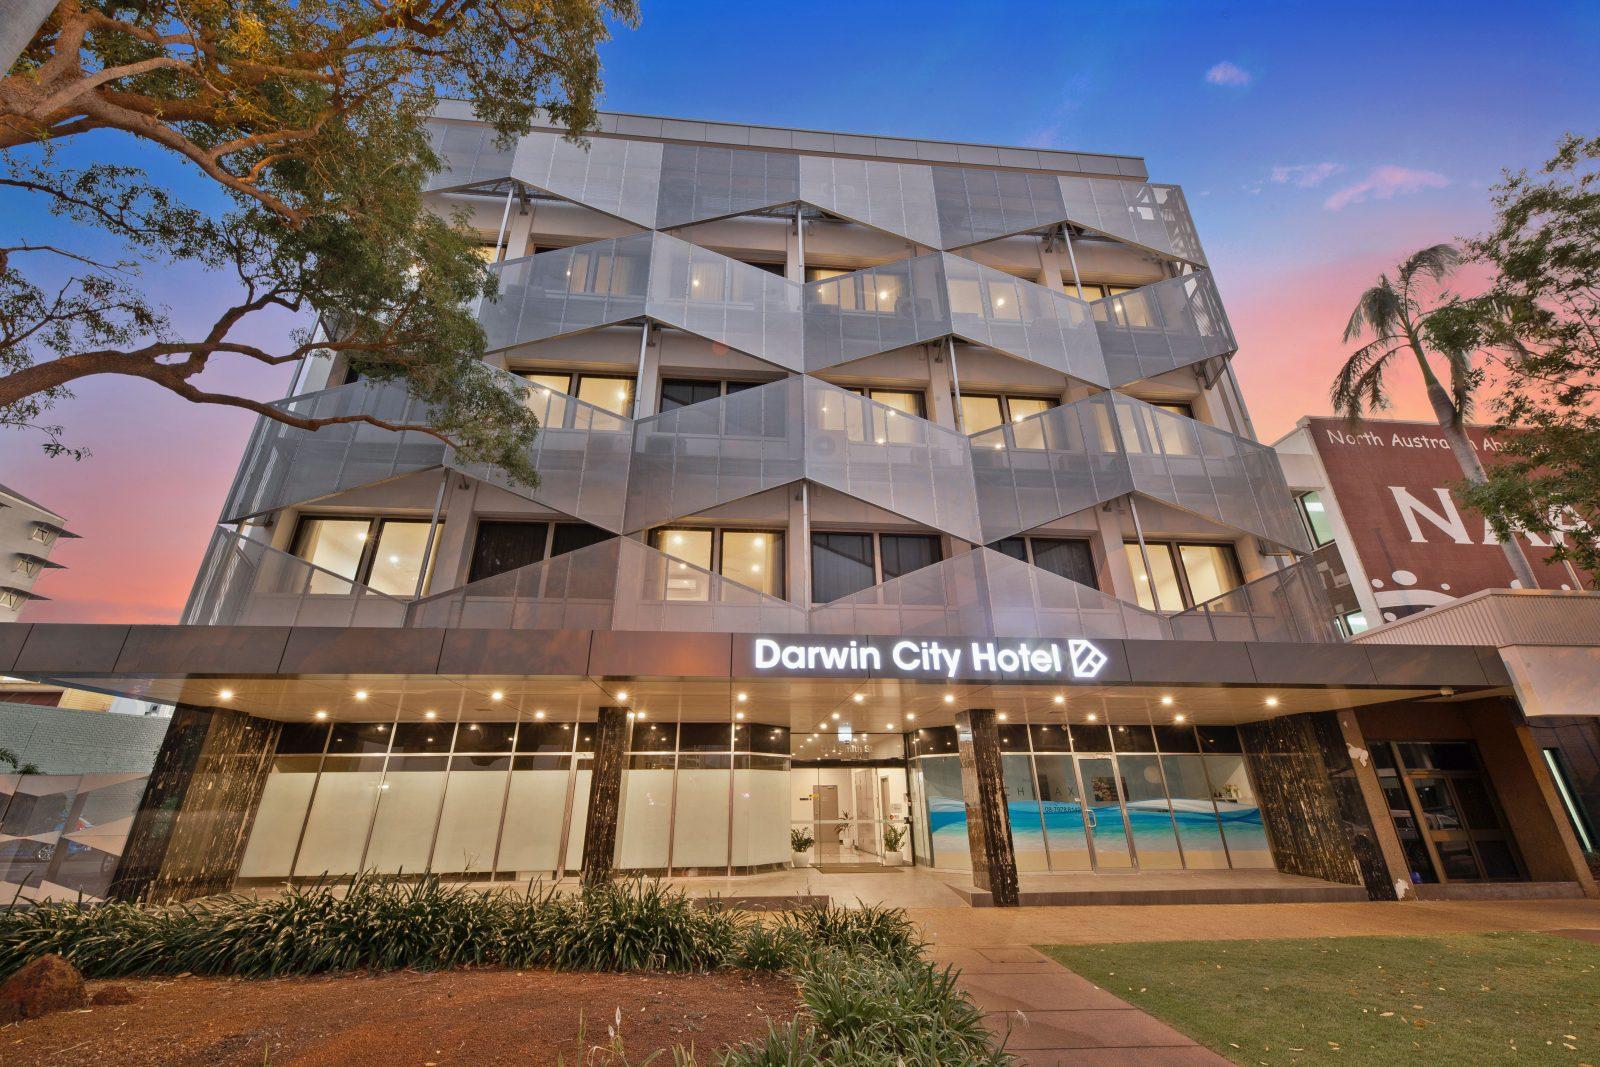 Darwin City Hotel Night View